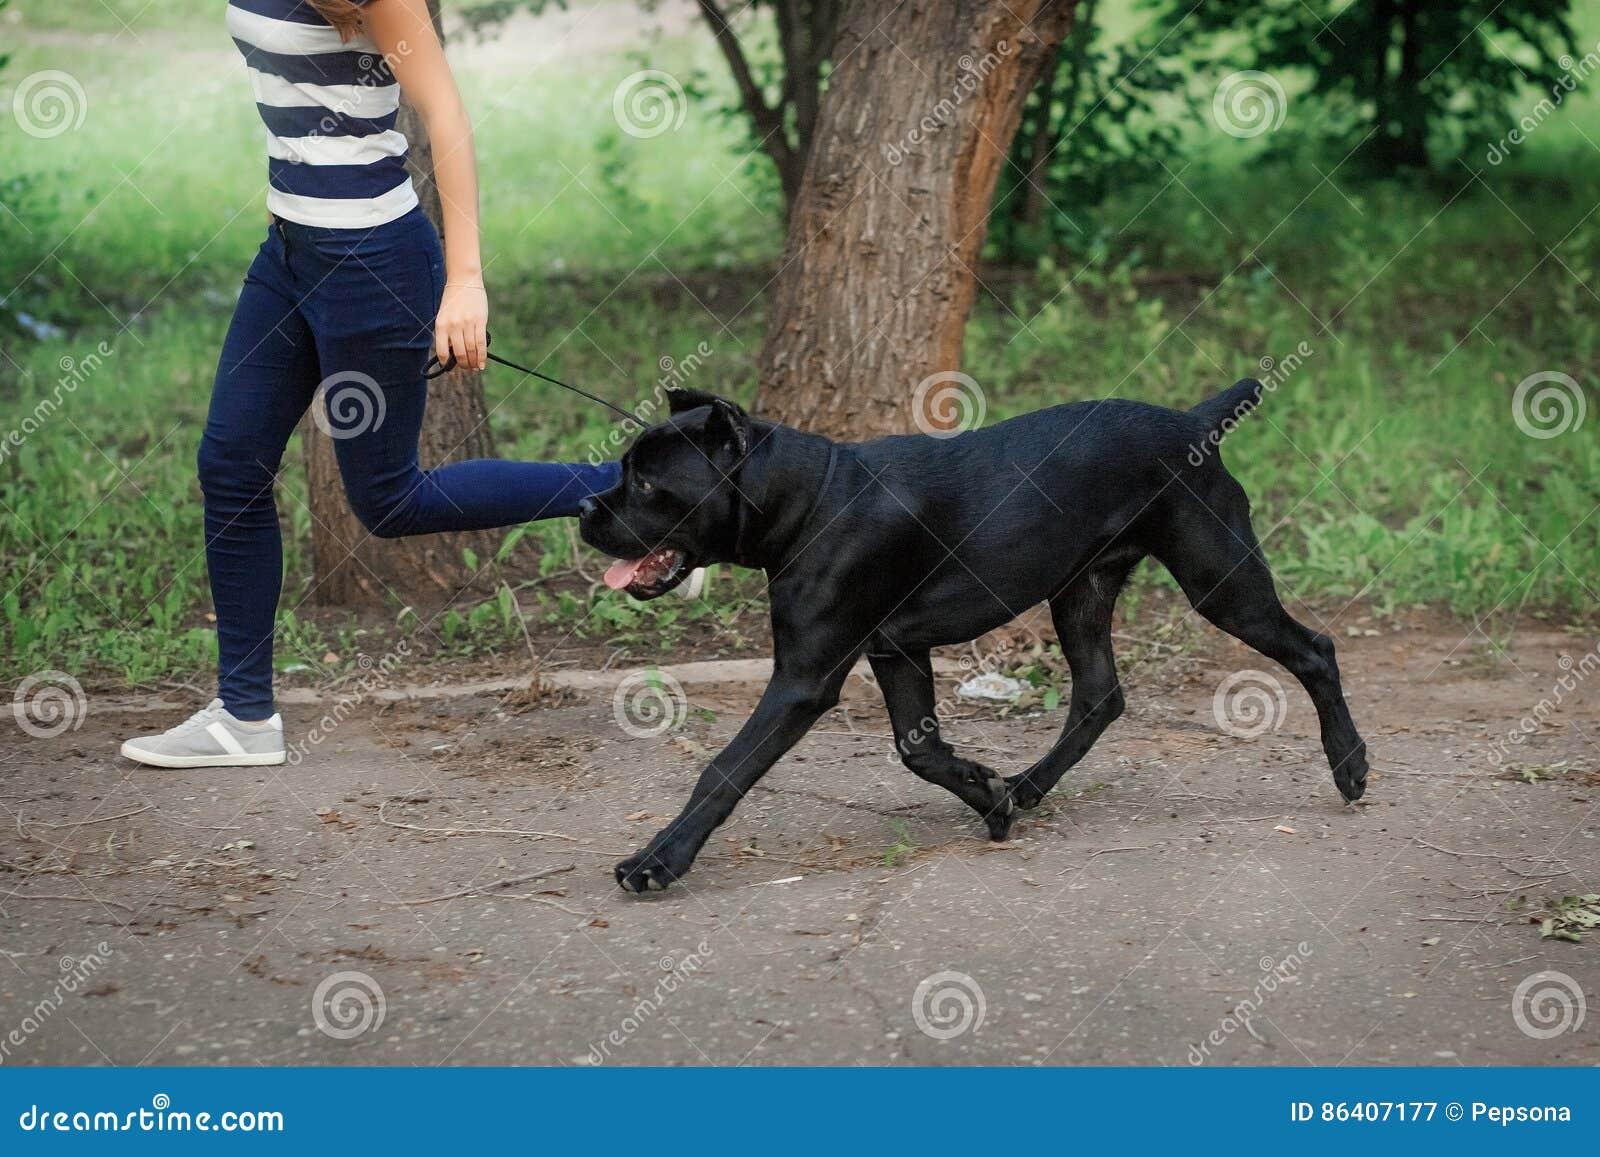 Lenker Mit Einem Hund Cane Corso Italian Mastiff Stockbild - Bild ...